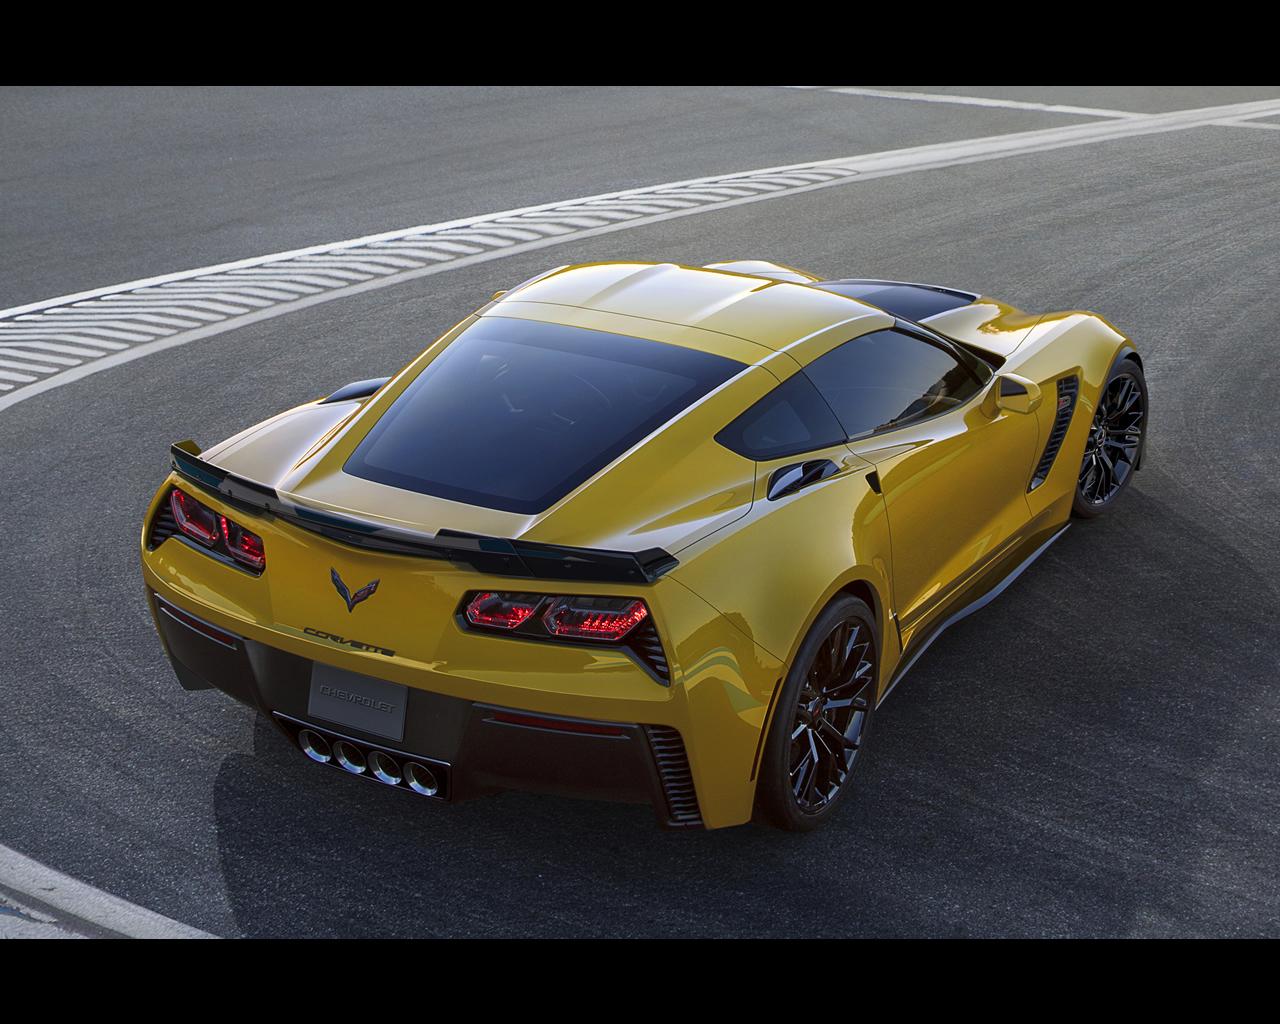 Chevrolet Corvette Stingray ZO6 and C7R 2015